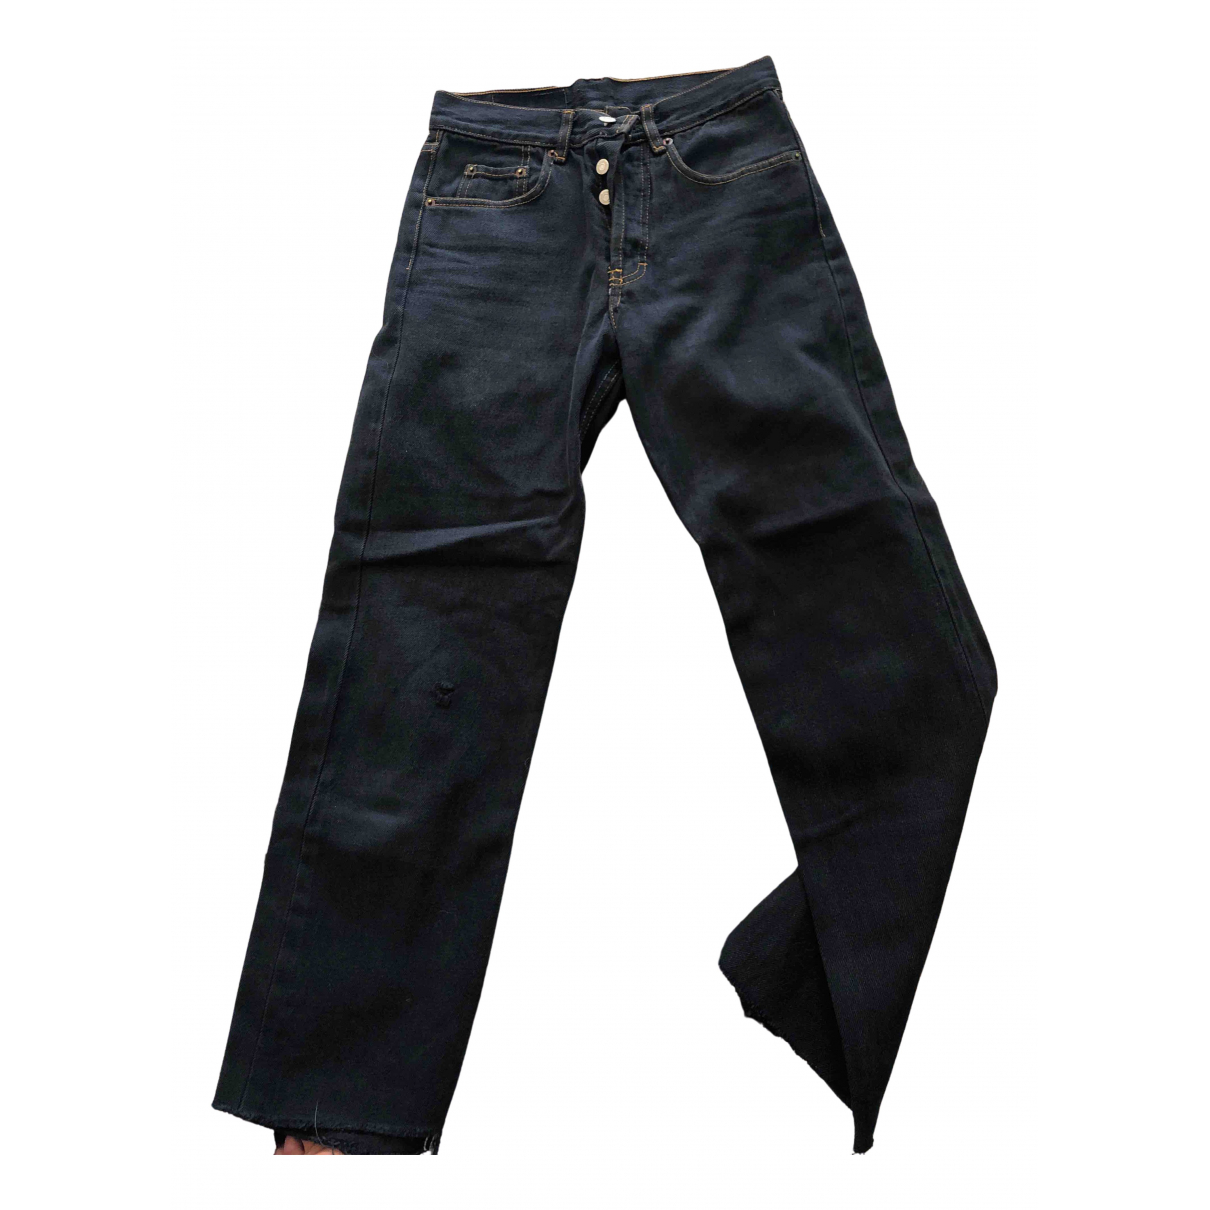 Levi's Vintage Clothing \N Blue Denim - Jeans Jeans for Women 27 US